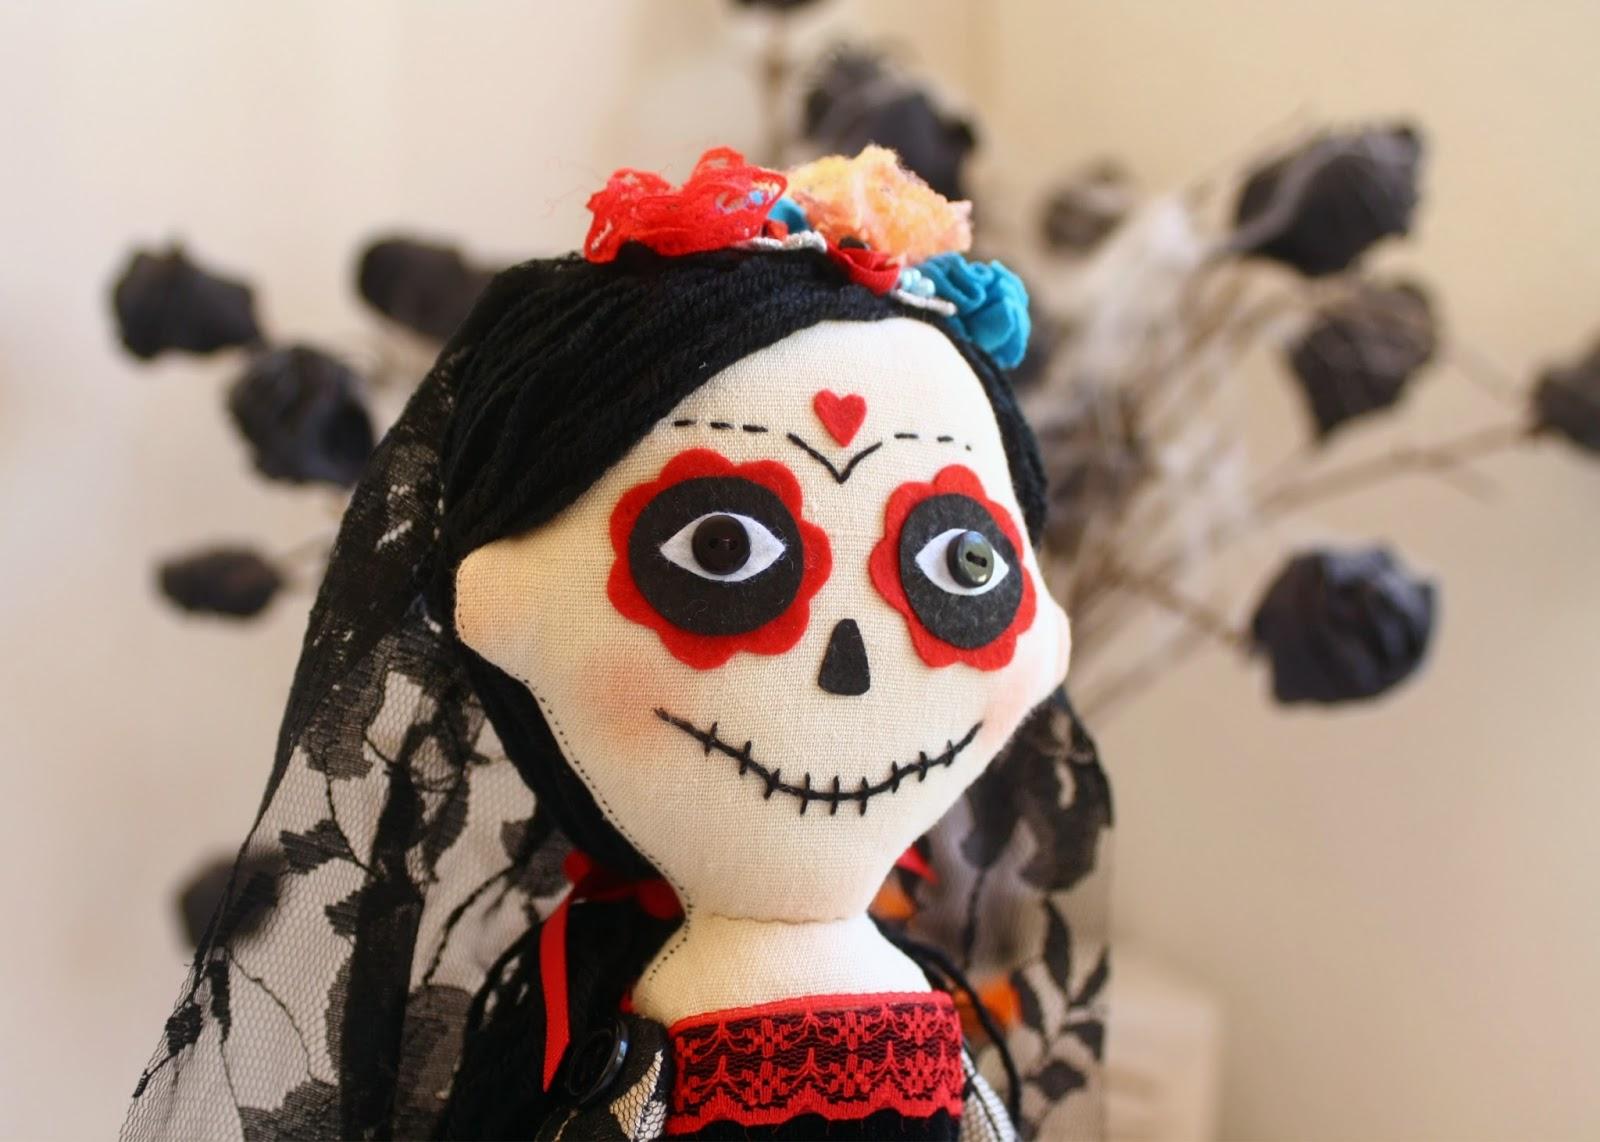 Rostro de muñeca La Catrina mexicana, halloween.